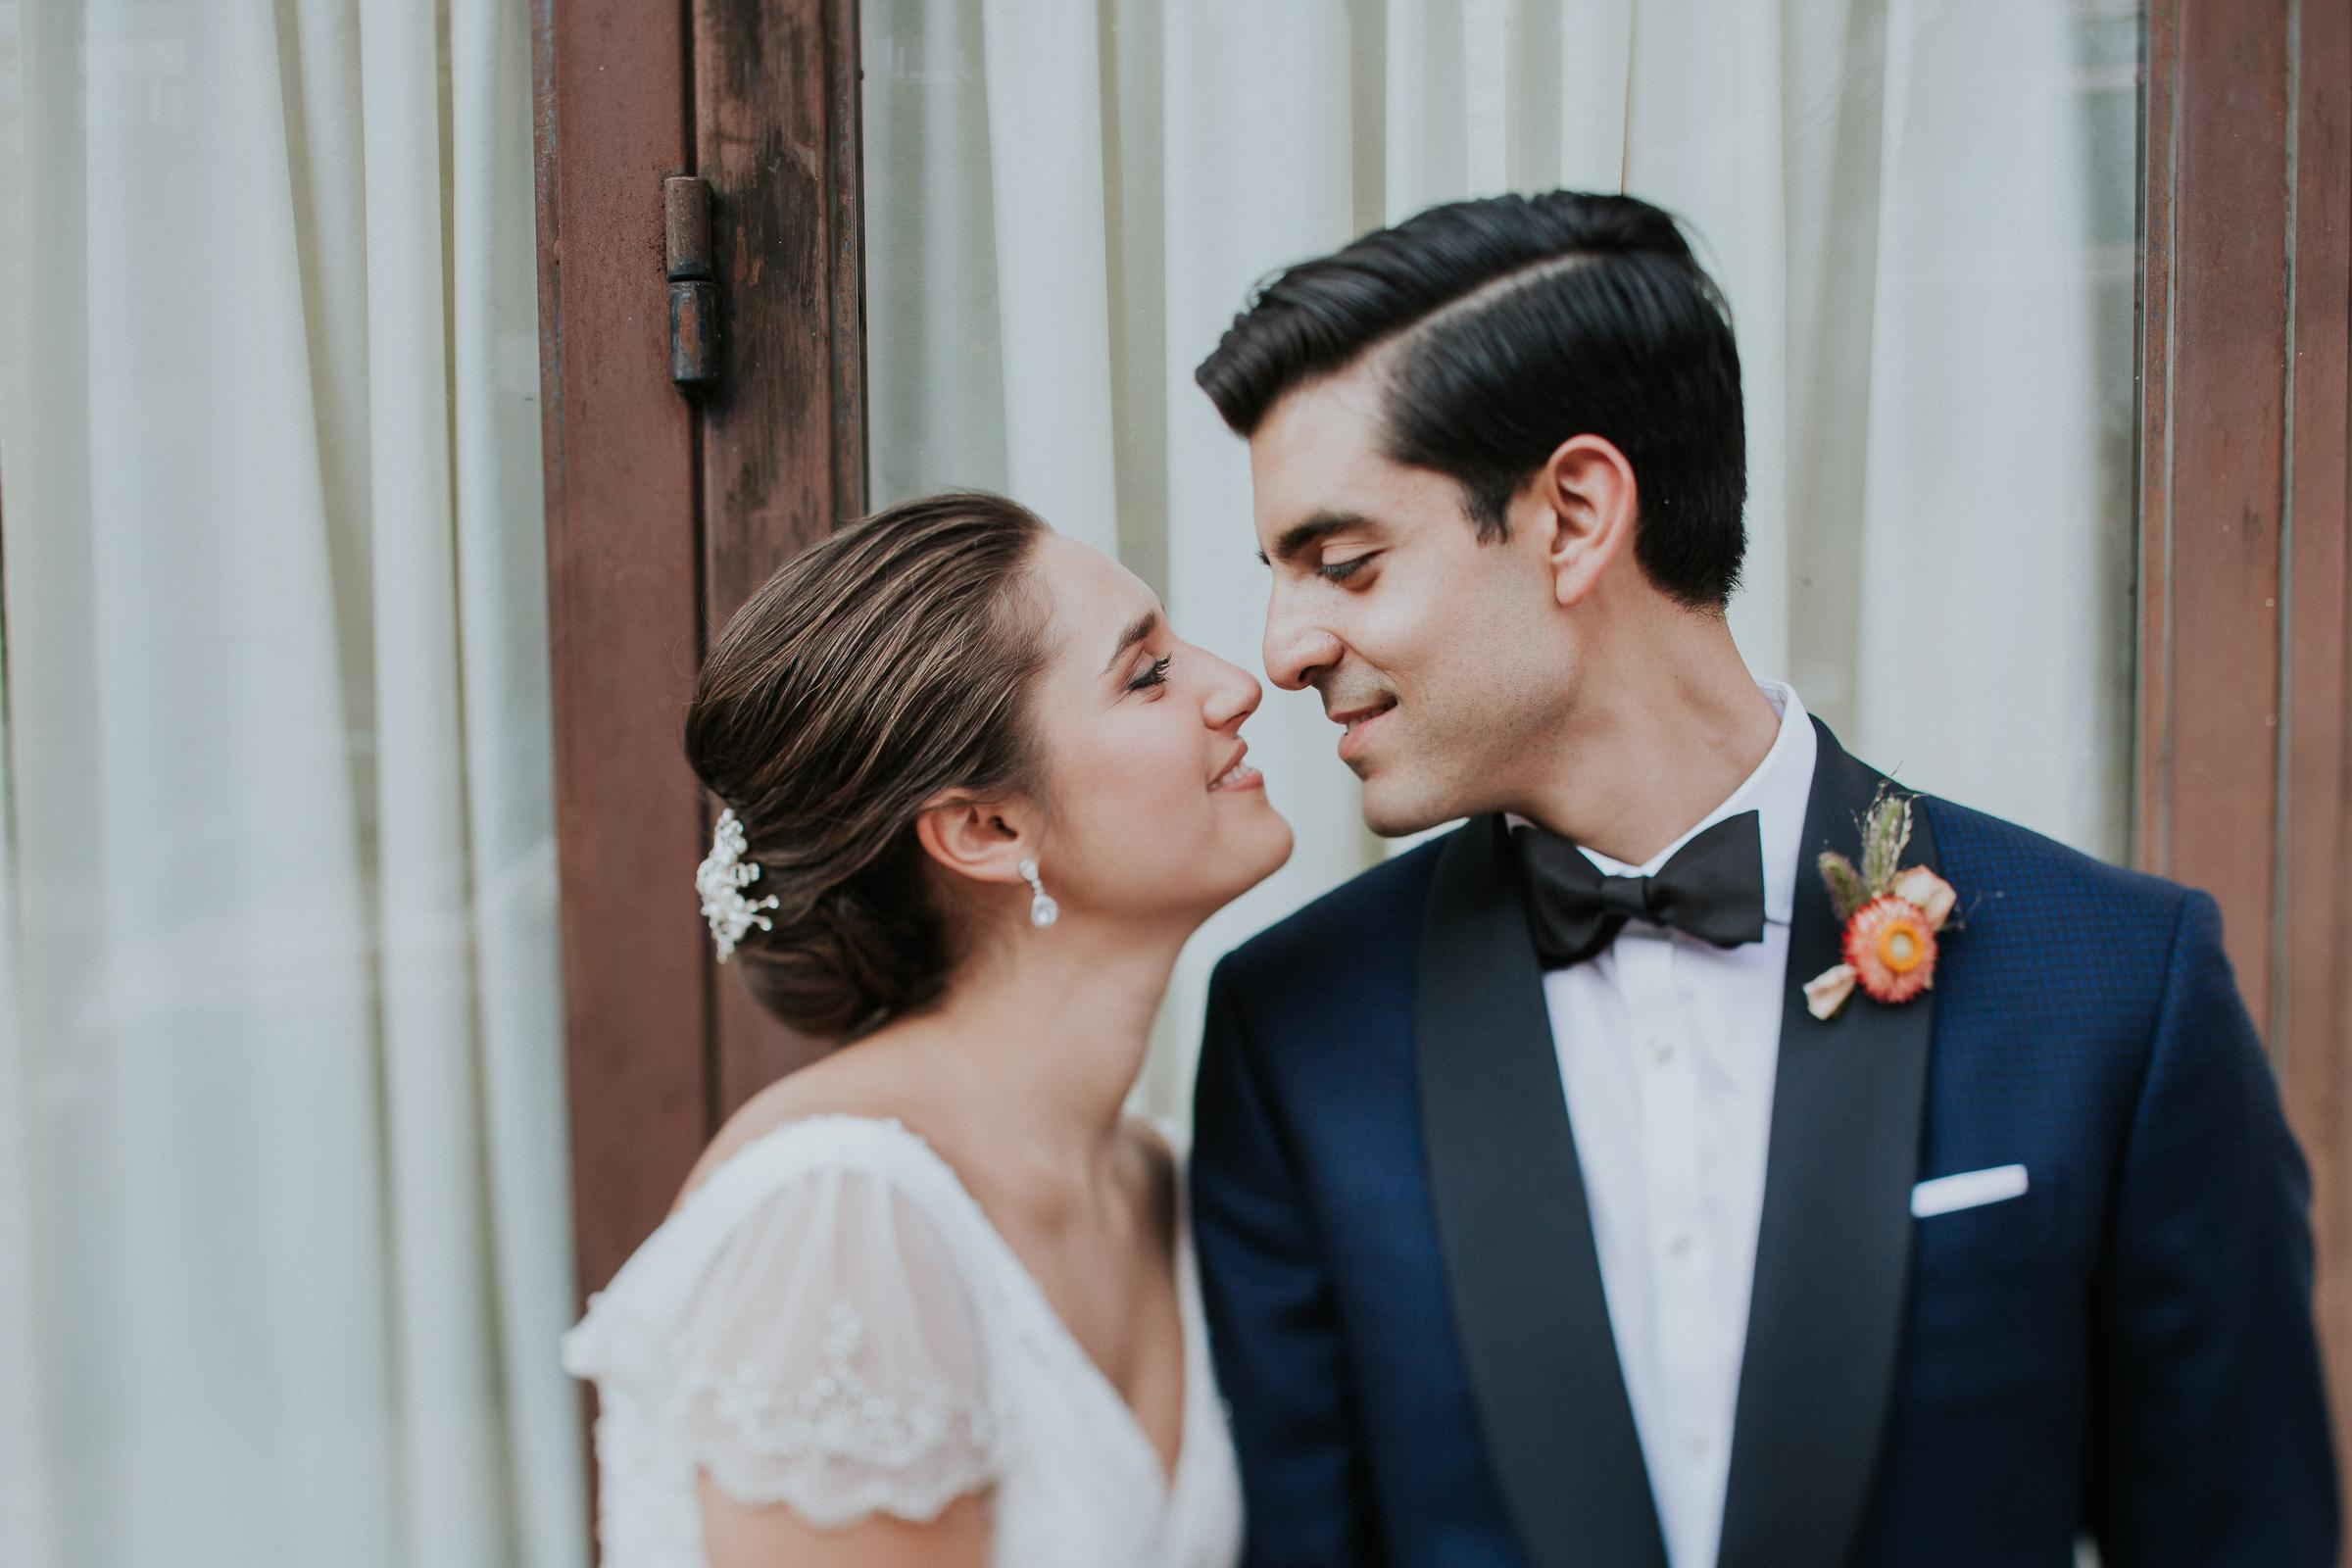 Brooklyn-Winery-NYC-Editorial-Documentary-Wedding-Photographer-Gina-Oli-58.jpg